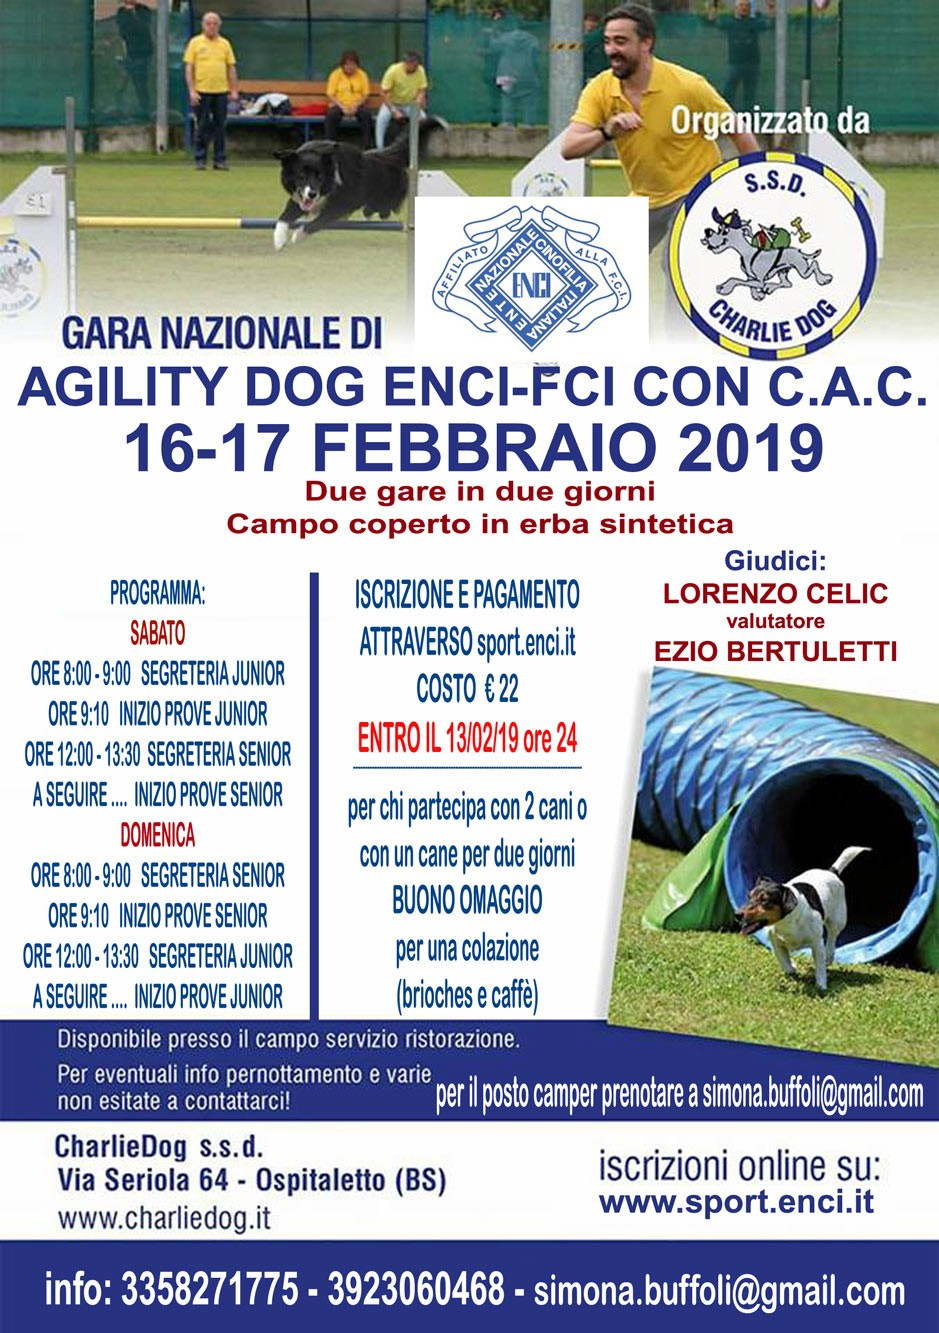 GARA NAZIONALE DI AGILITY CHARLIE DOG 16 FEBBRAIO